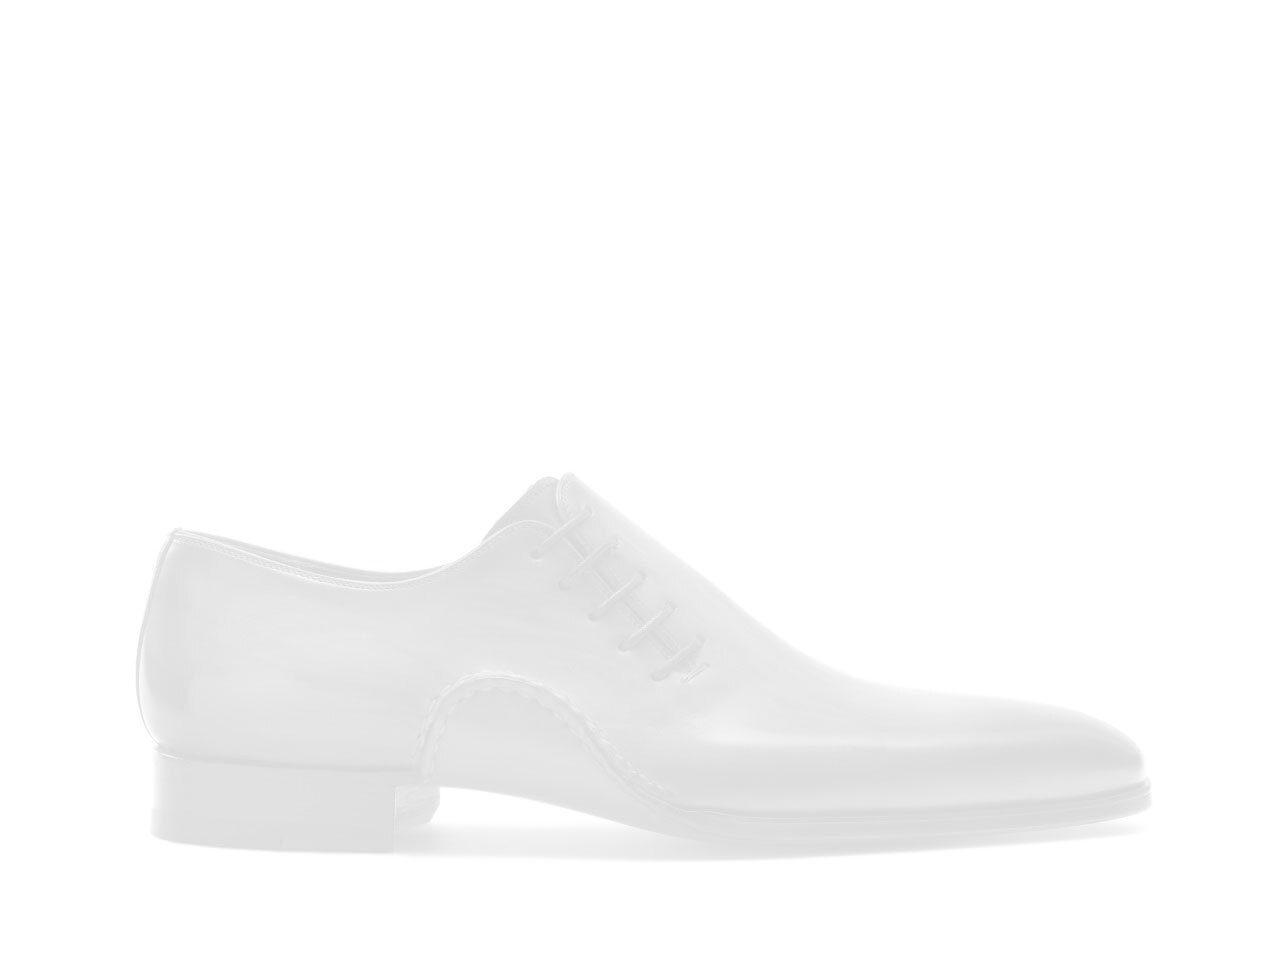 Sole of the Magnanni Utrera Lo Cognac Men's Sneakers